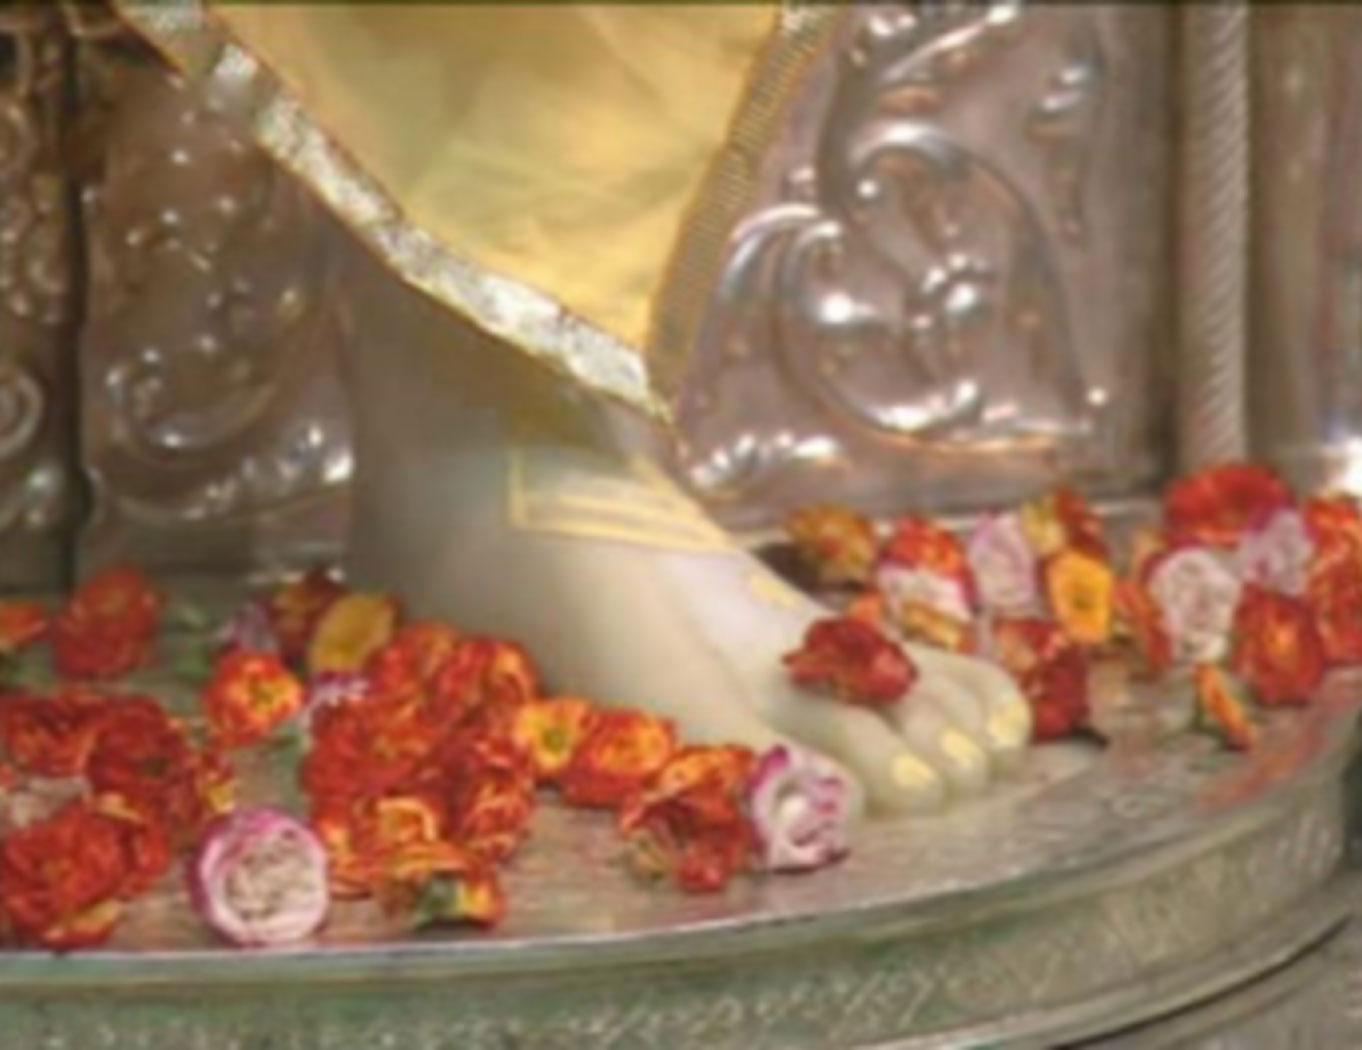 A Couple of Sai Baba Experiences - Part 813